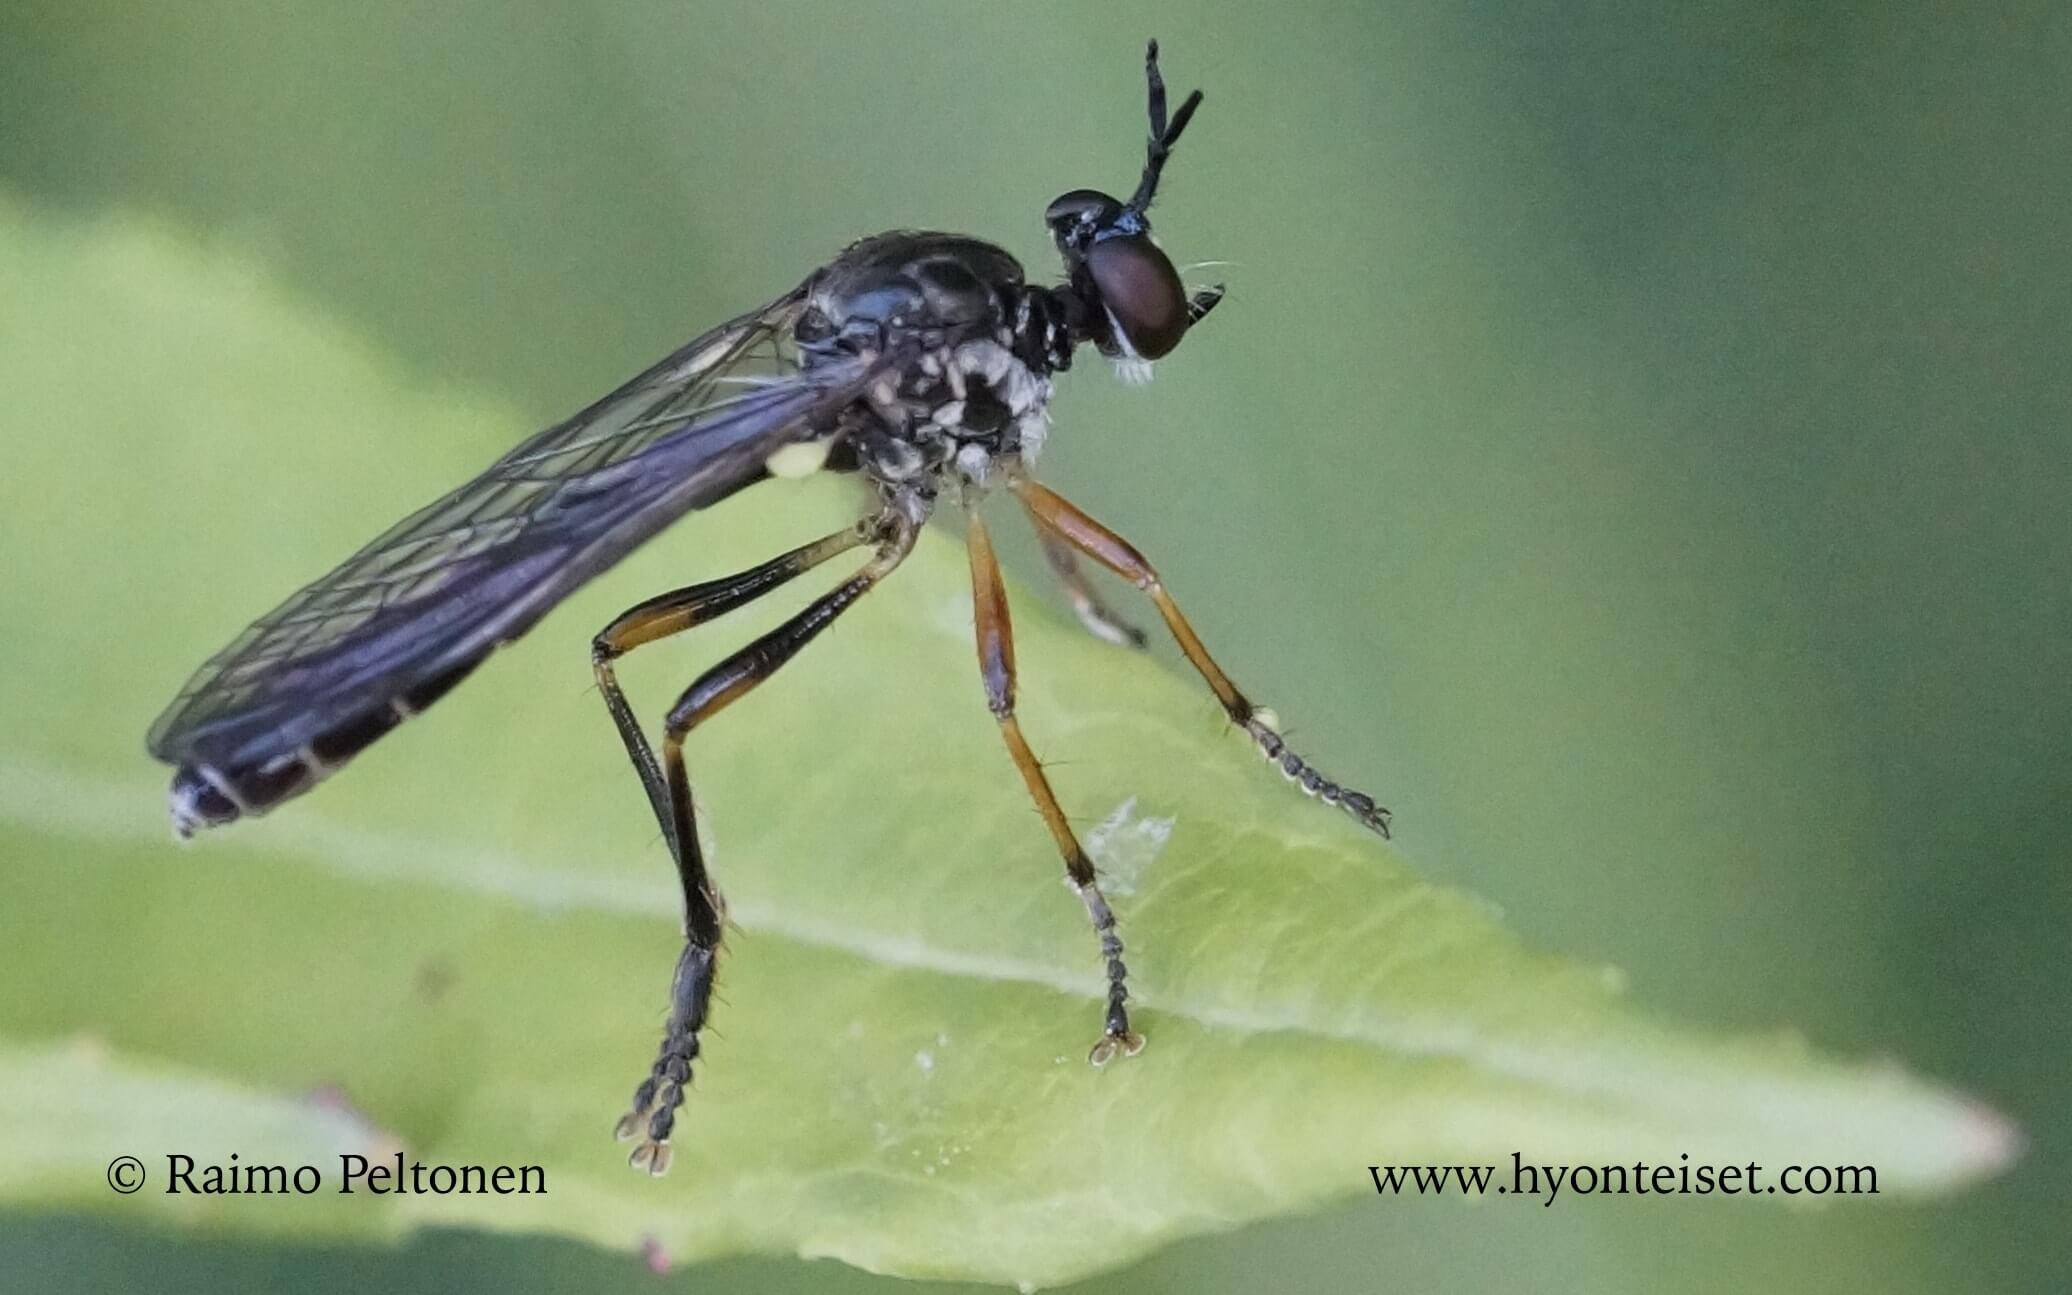 Dioctria hyalipennis (det. Kaj Winqvist)